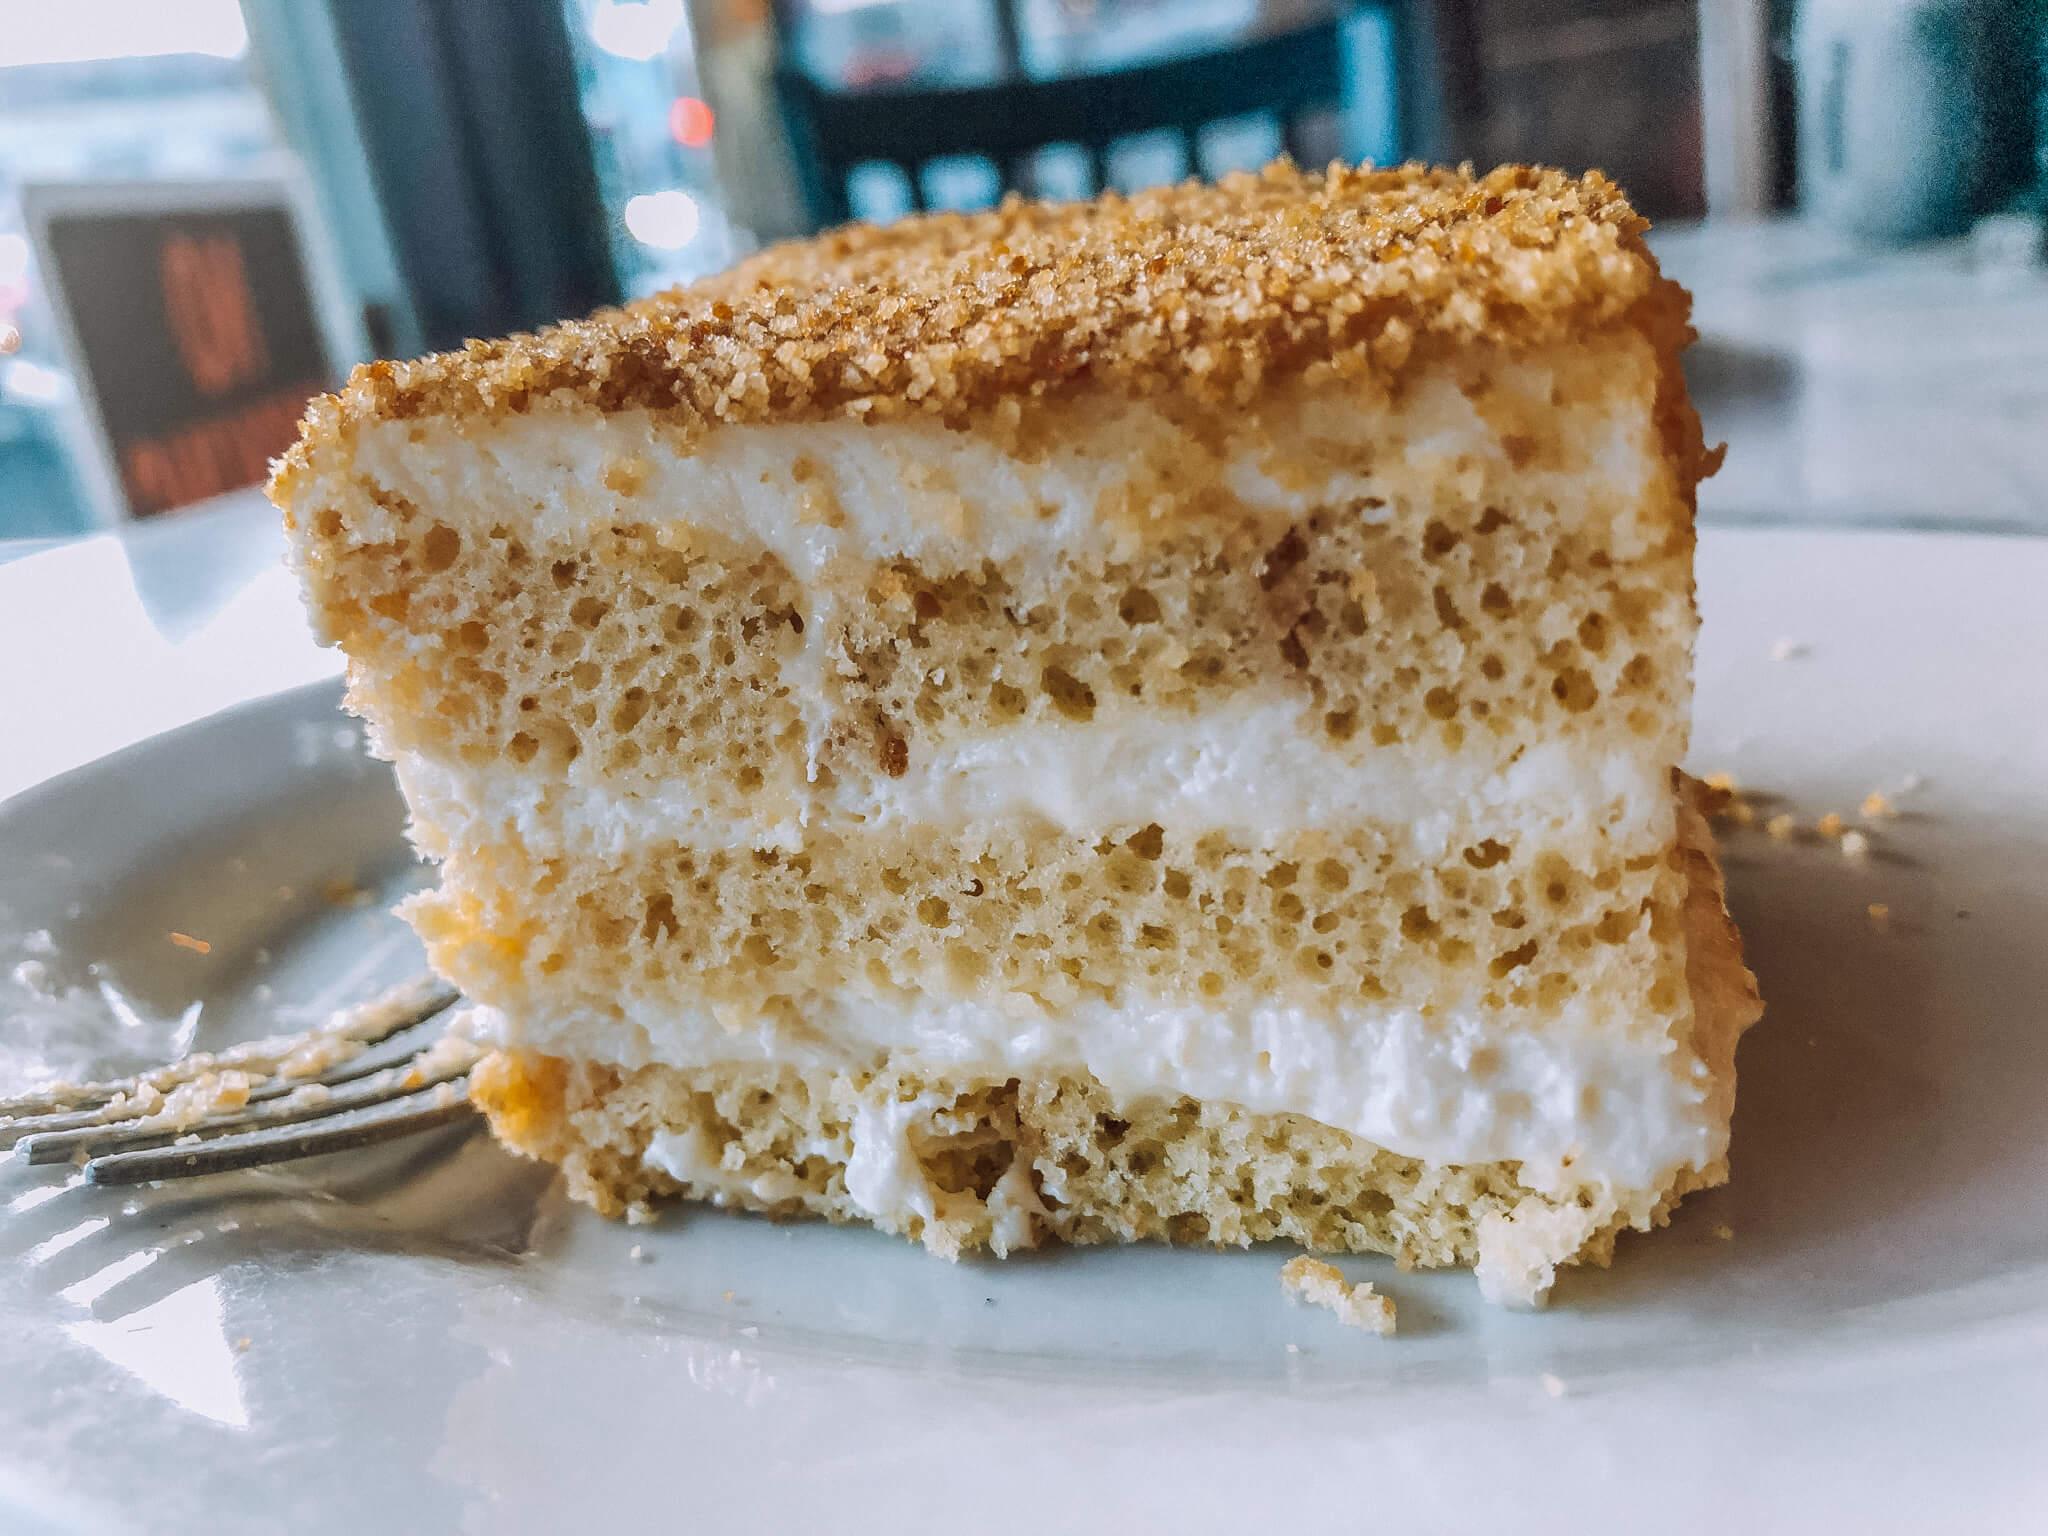 stella bakery sacripantina